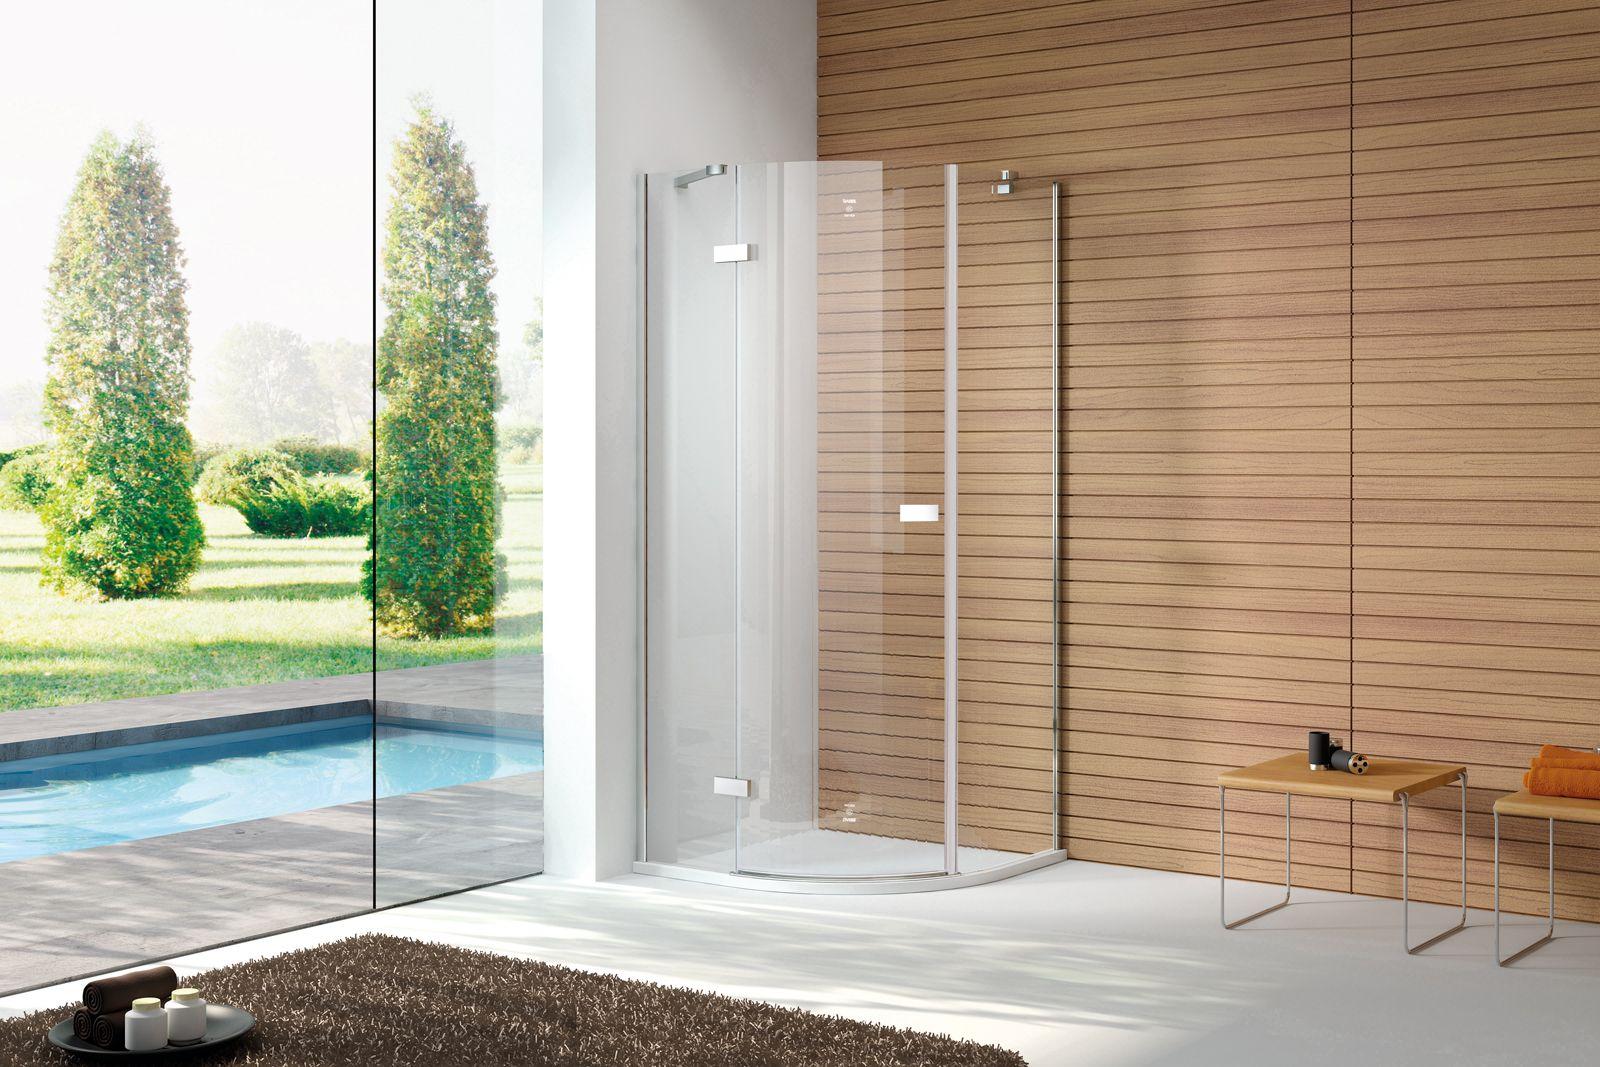 Shower Door Pivot Hinge Replacement Parts Framed Pin Pivot Hinge Neo Angle Shower Doors Corner Shower Enclosures Shower Doors